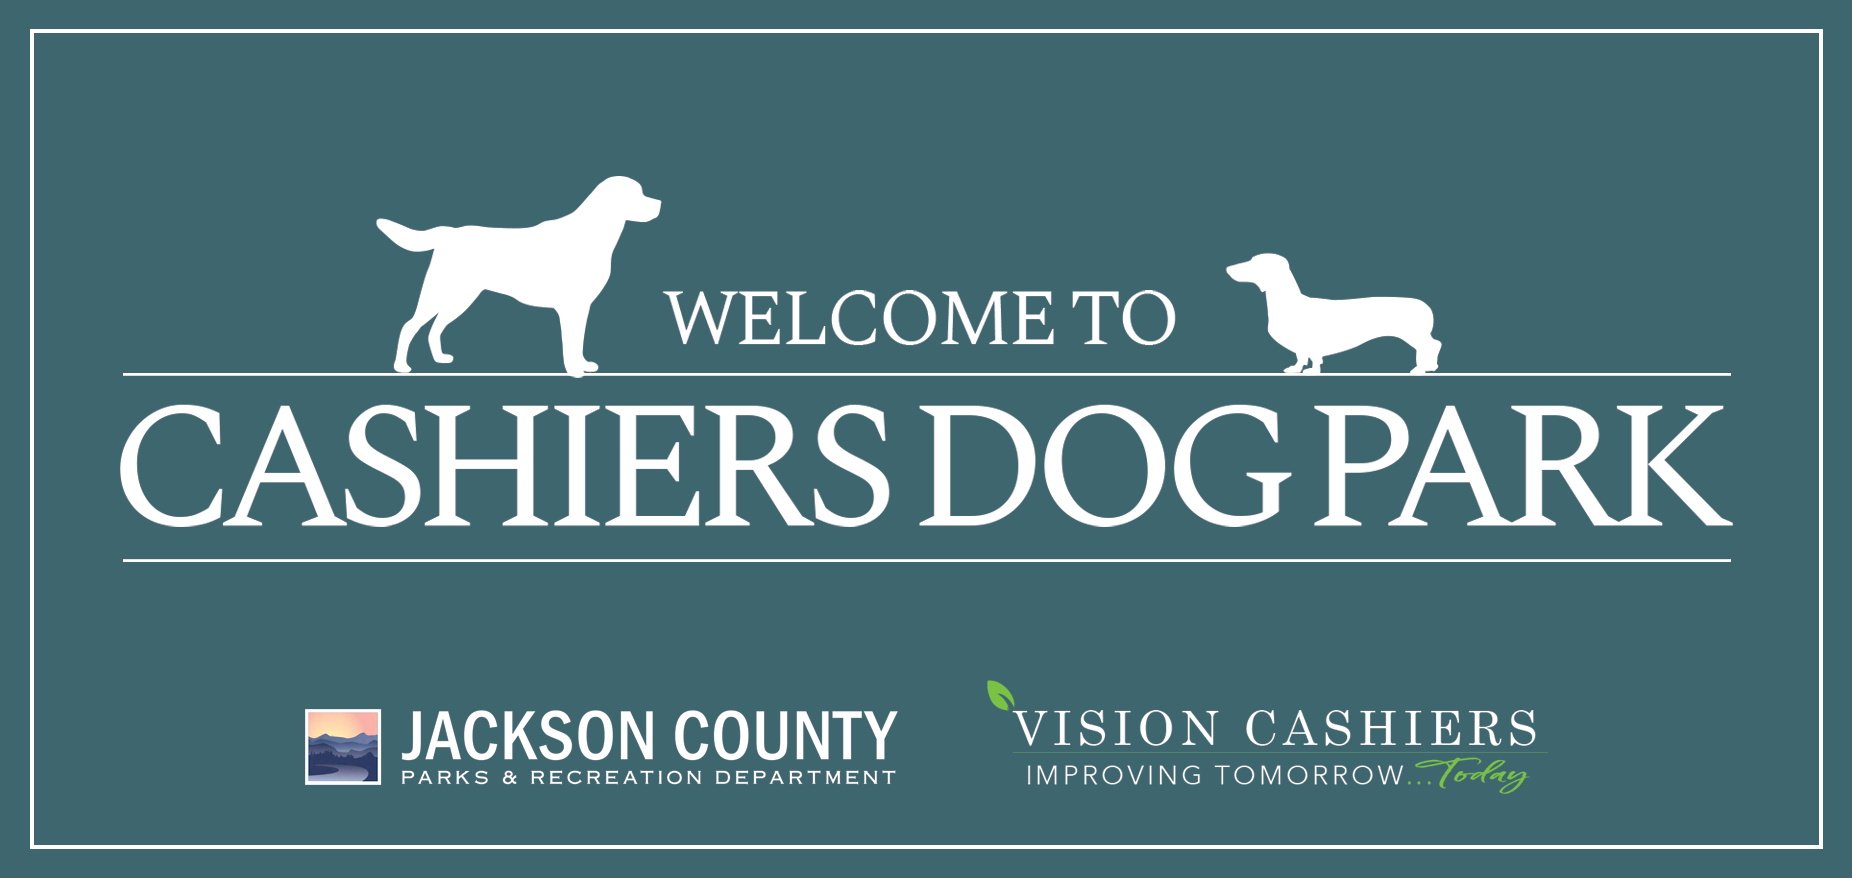 Vision Cashiers Dog Park Sign